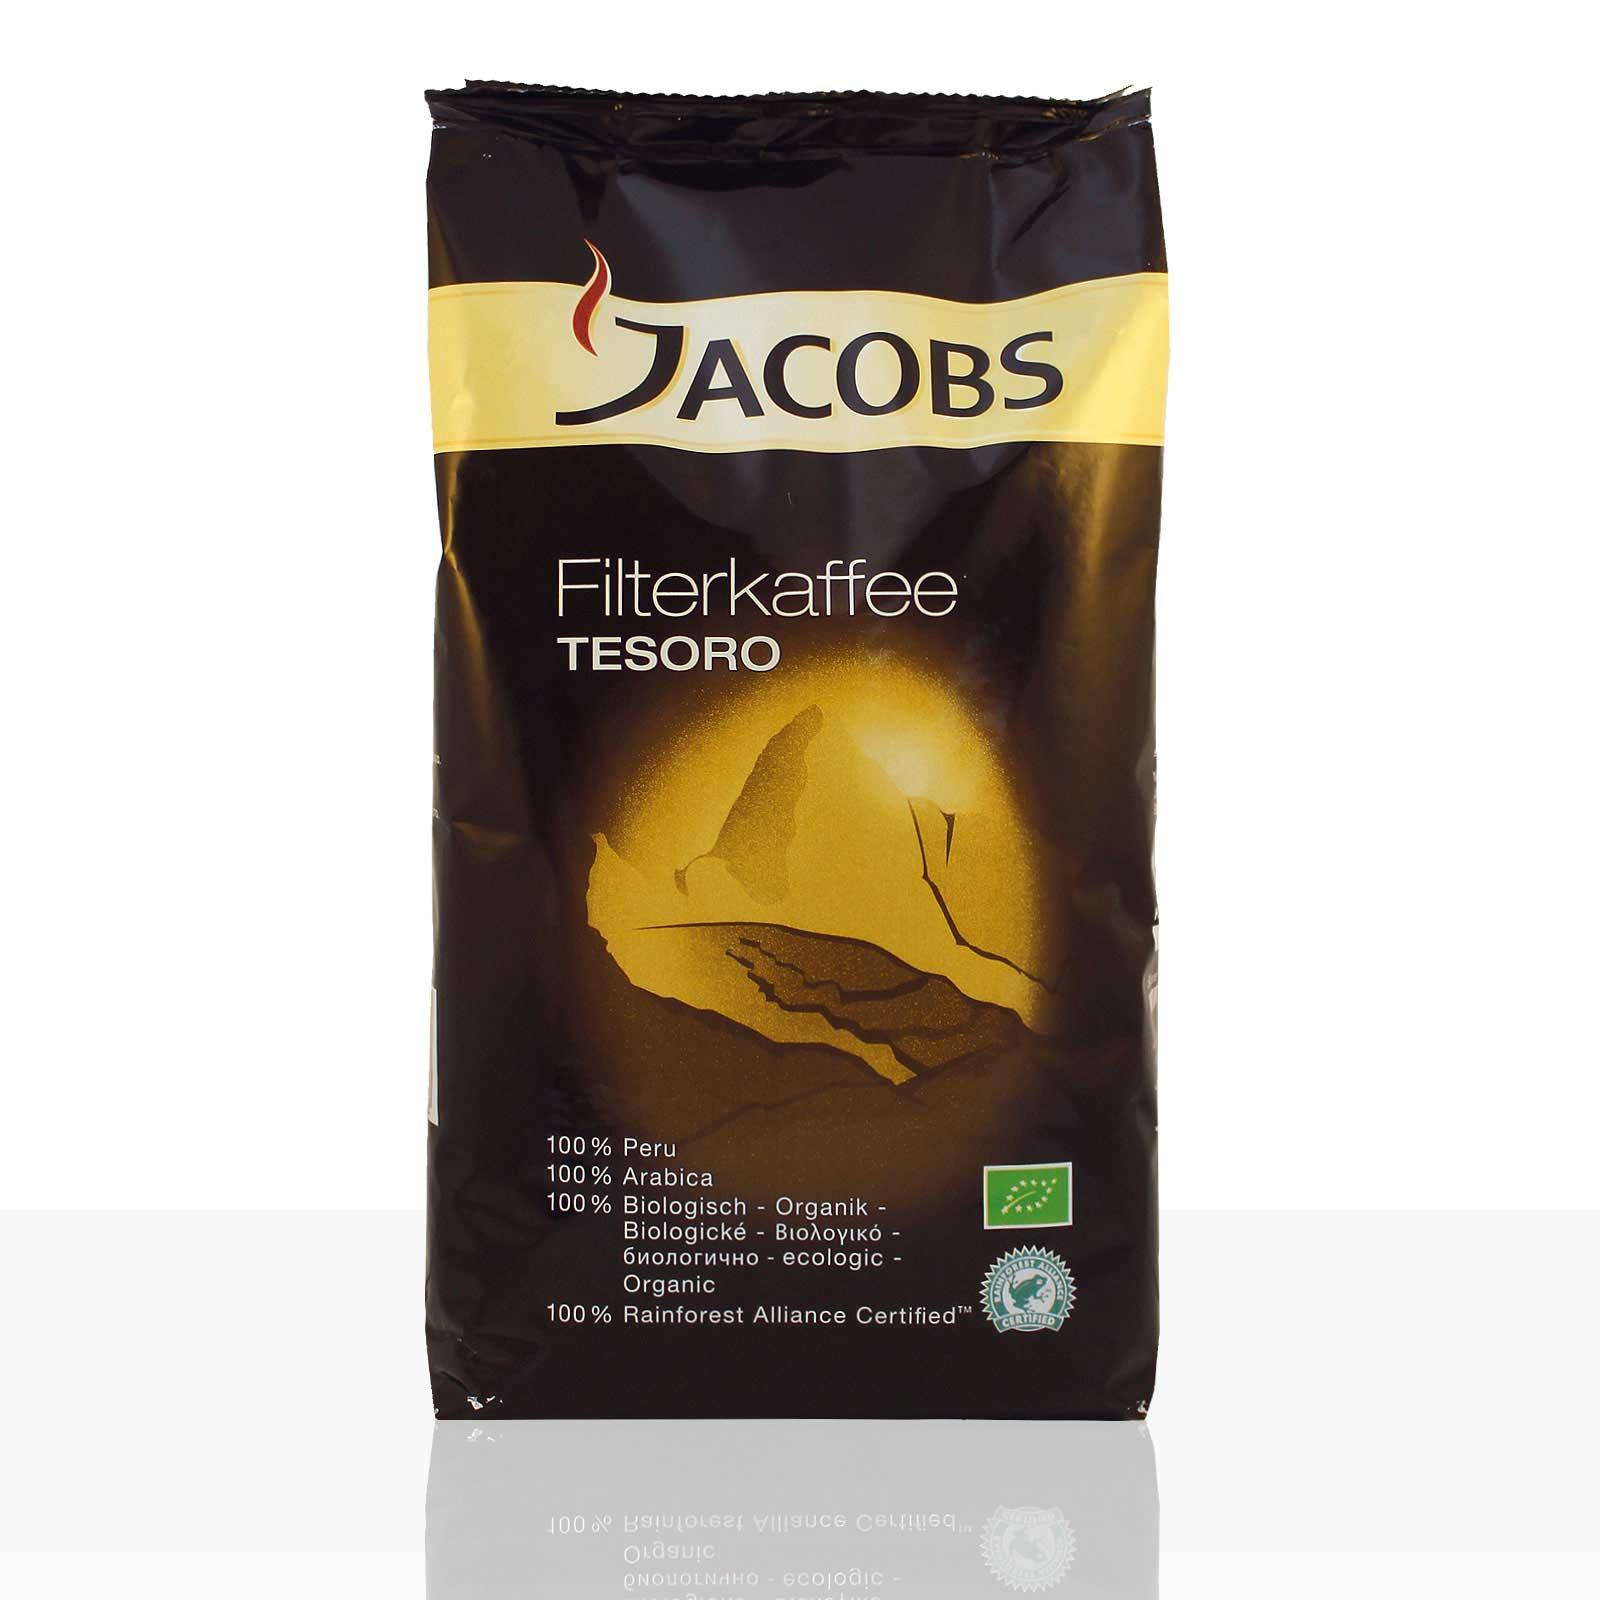 Jacobs Tesoro Filterkaffee Bio - 1kg Kaffee gemahlen, 100% Arabica